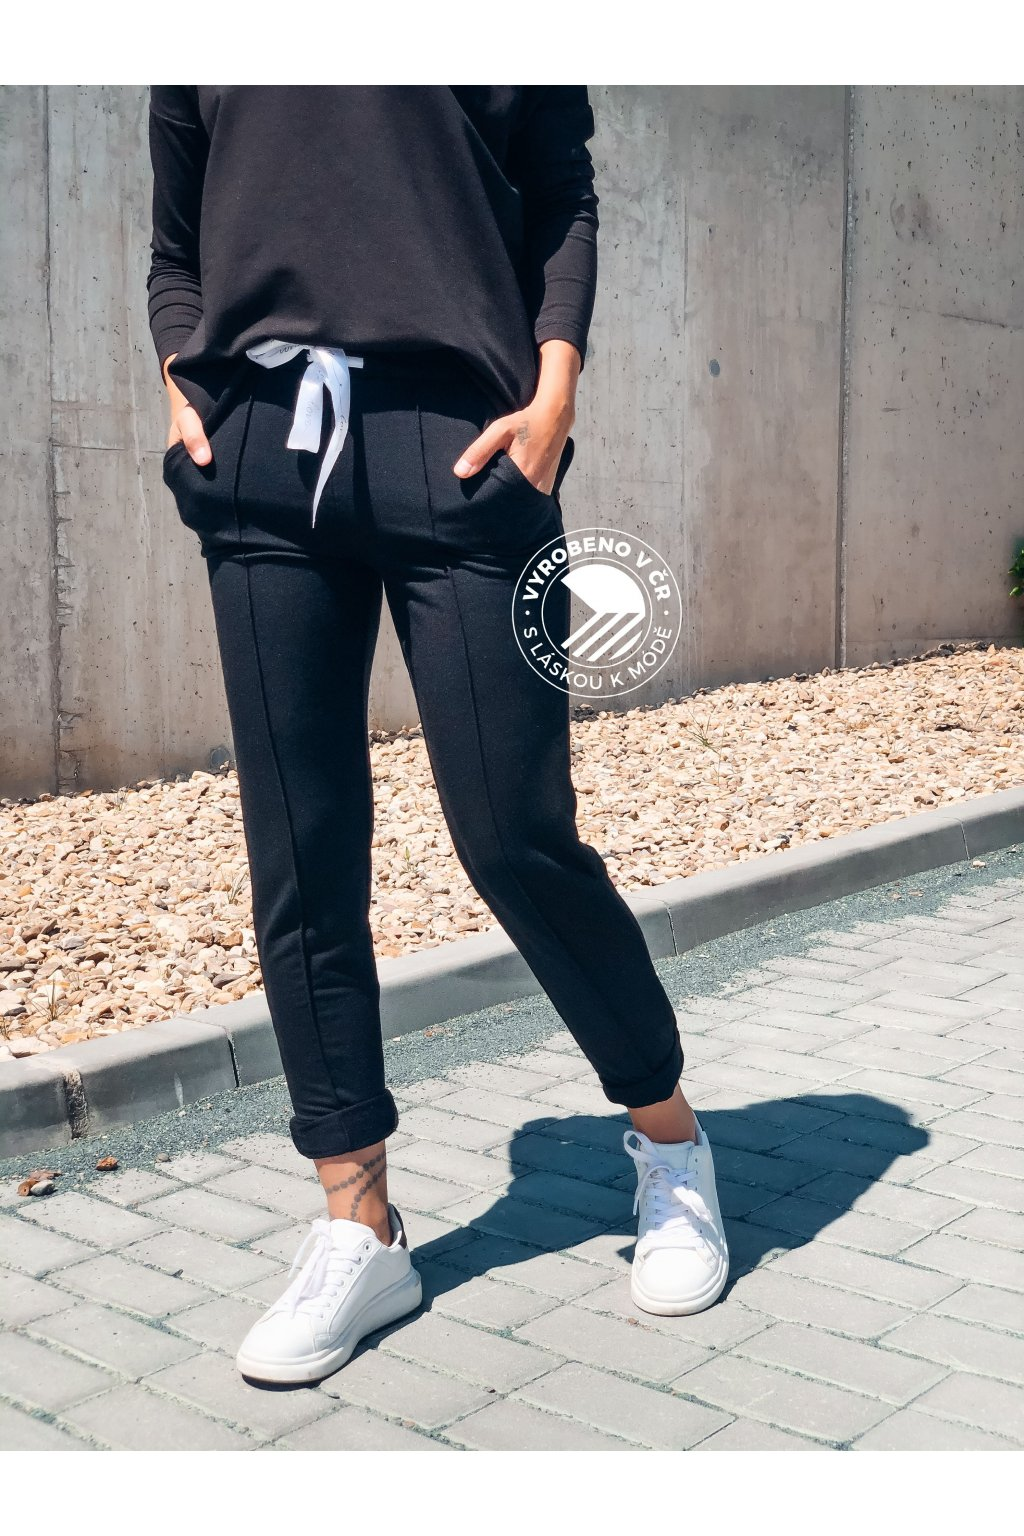 eshopat cz damske teplakove kalhoty black